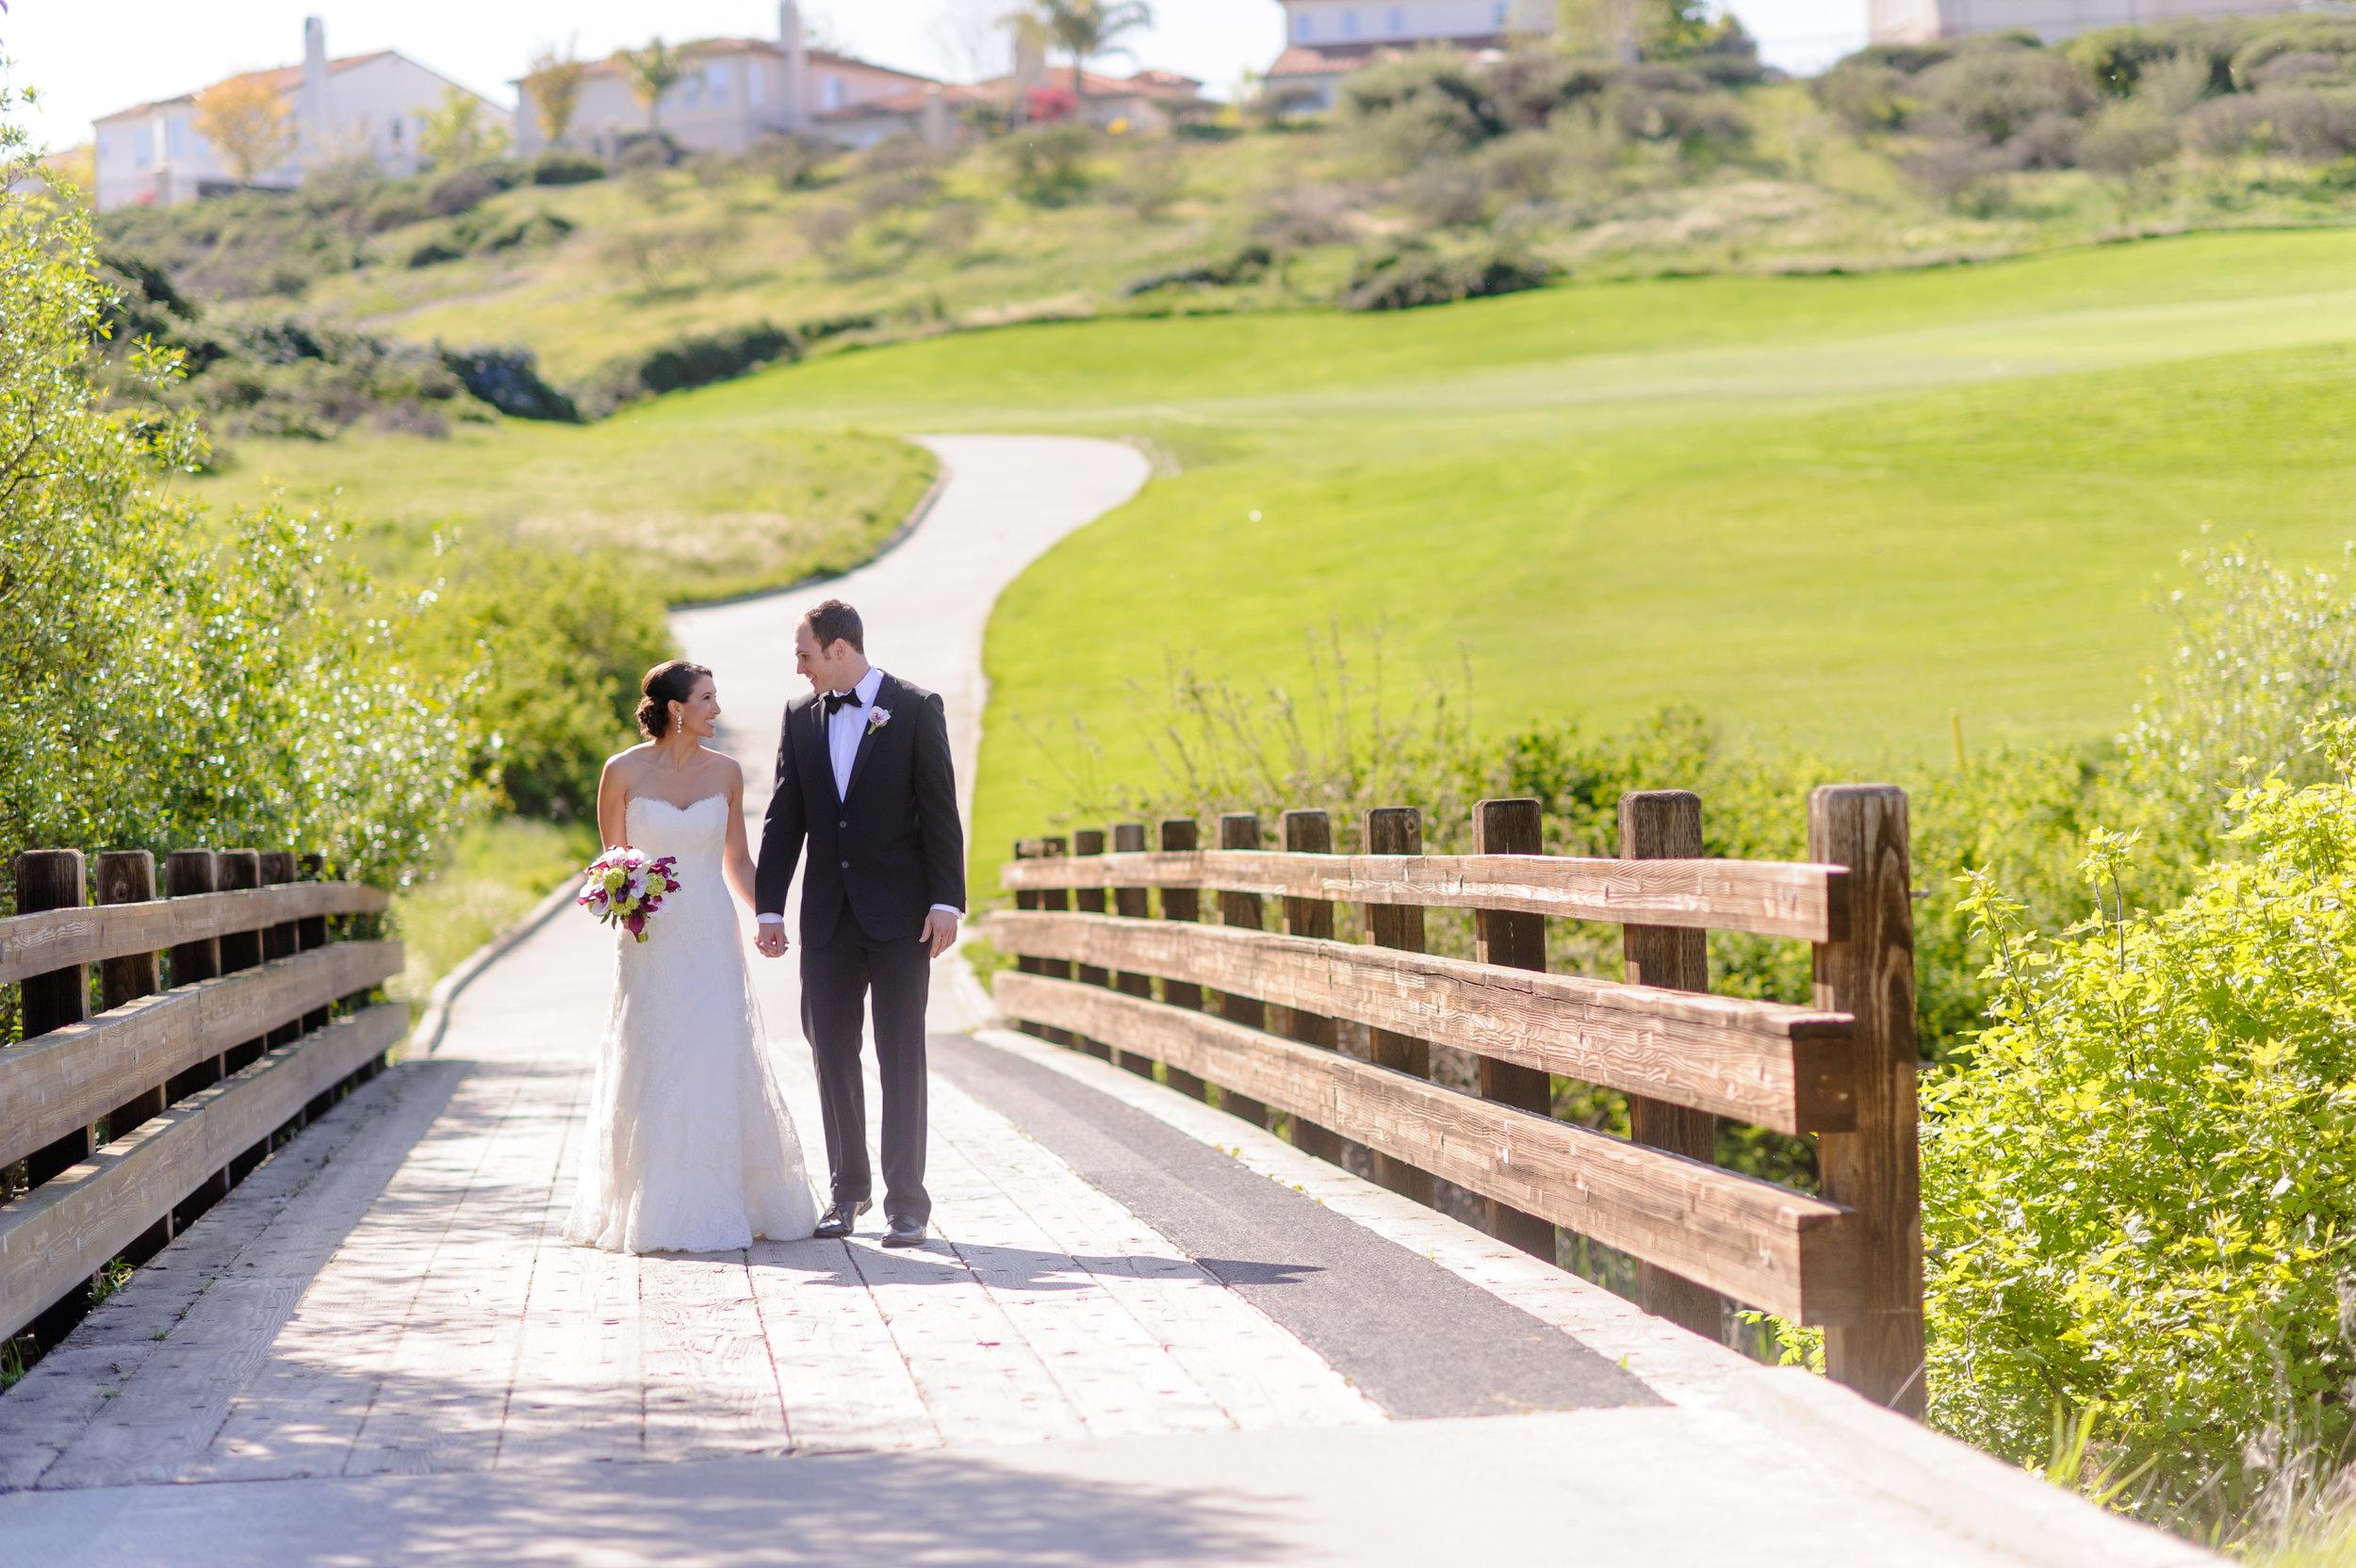 lindsey-jake-012-the-bridges-golf-course-san-ramon-wedding-photographer-katherine-nicole-photography.JPG